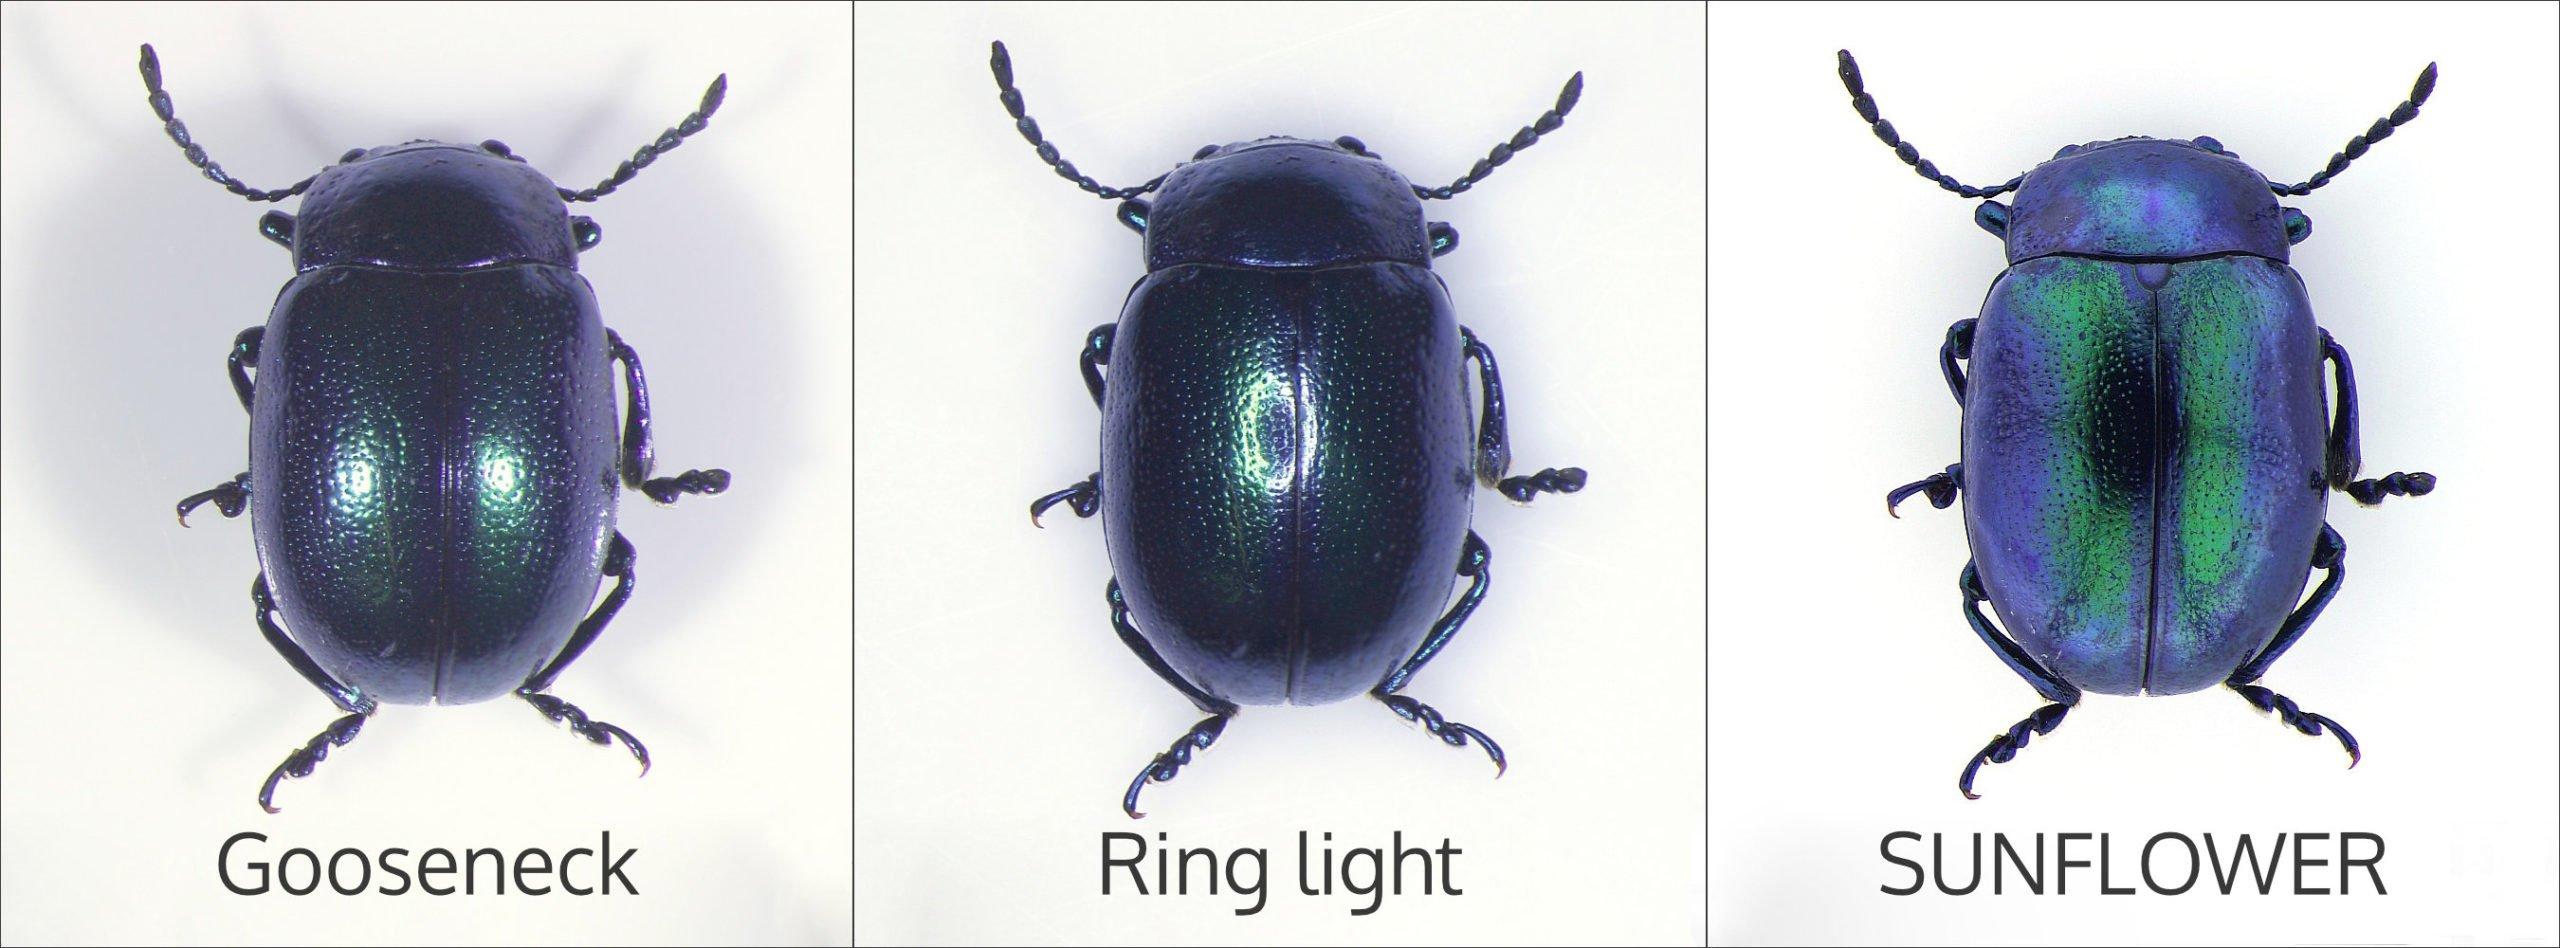 dung-beetle-illuminators-comparison